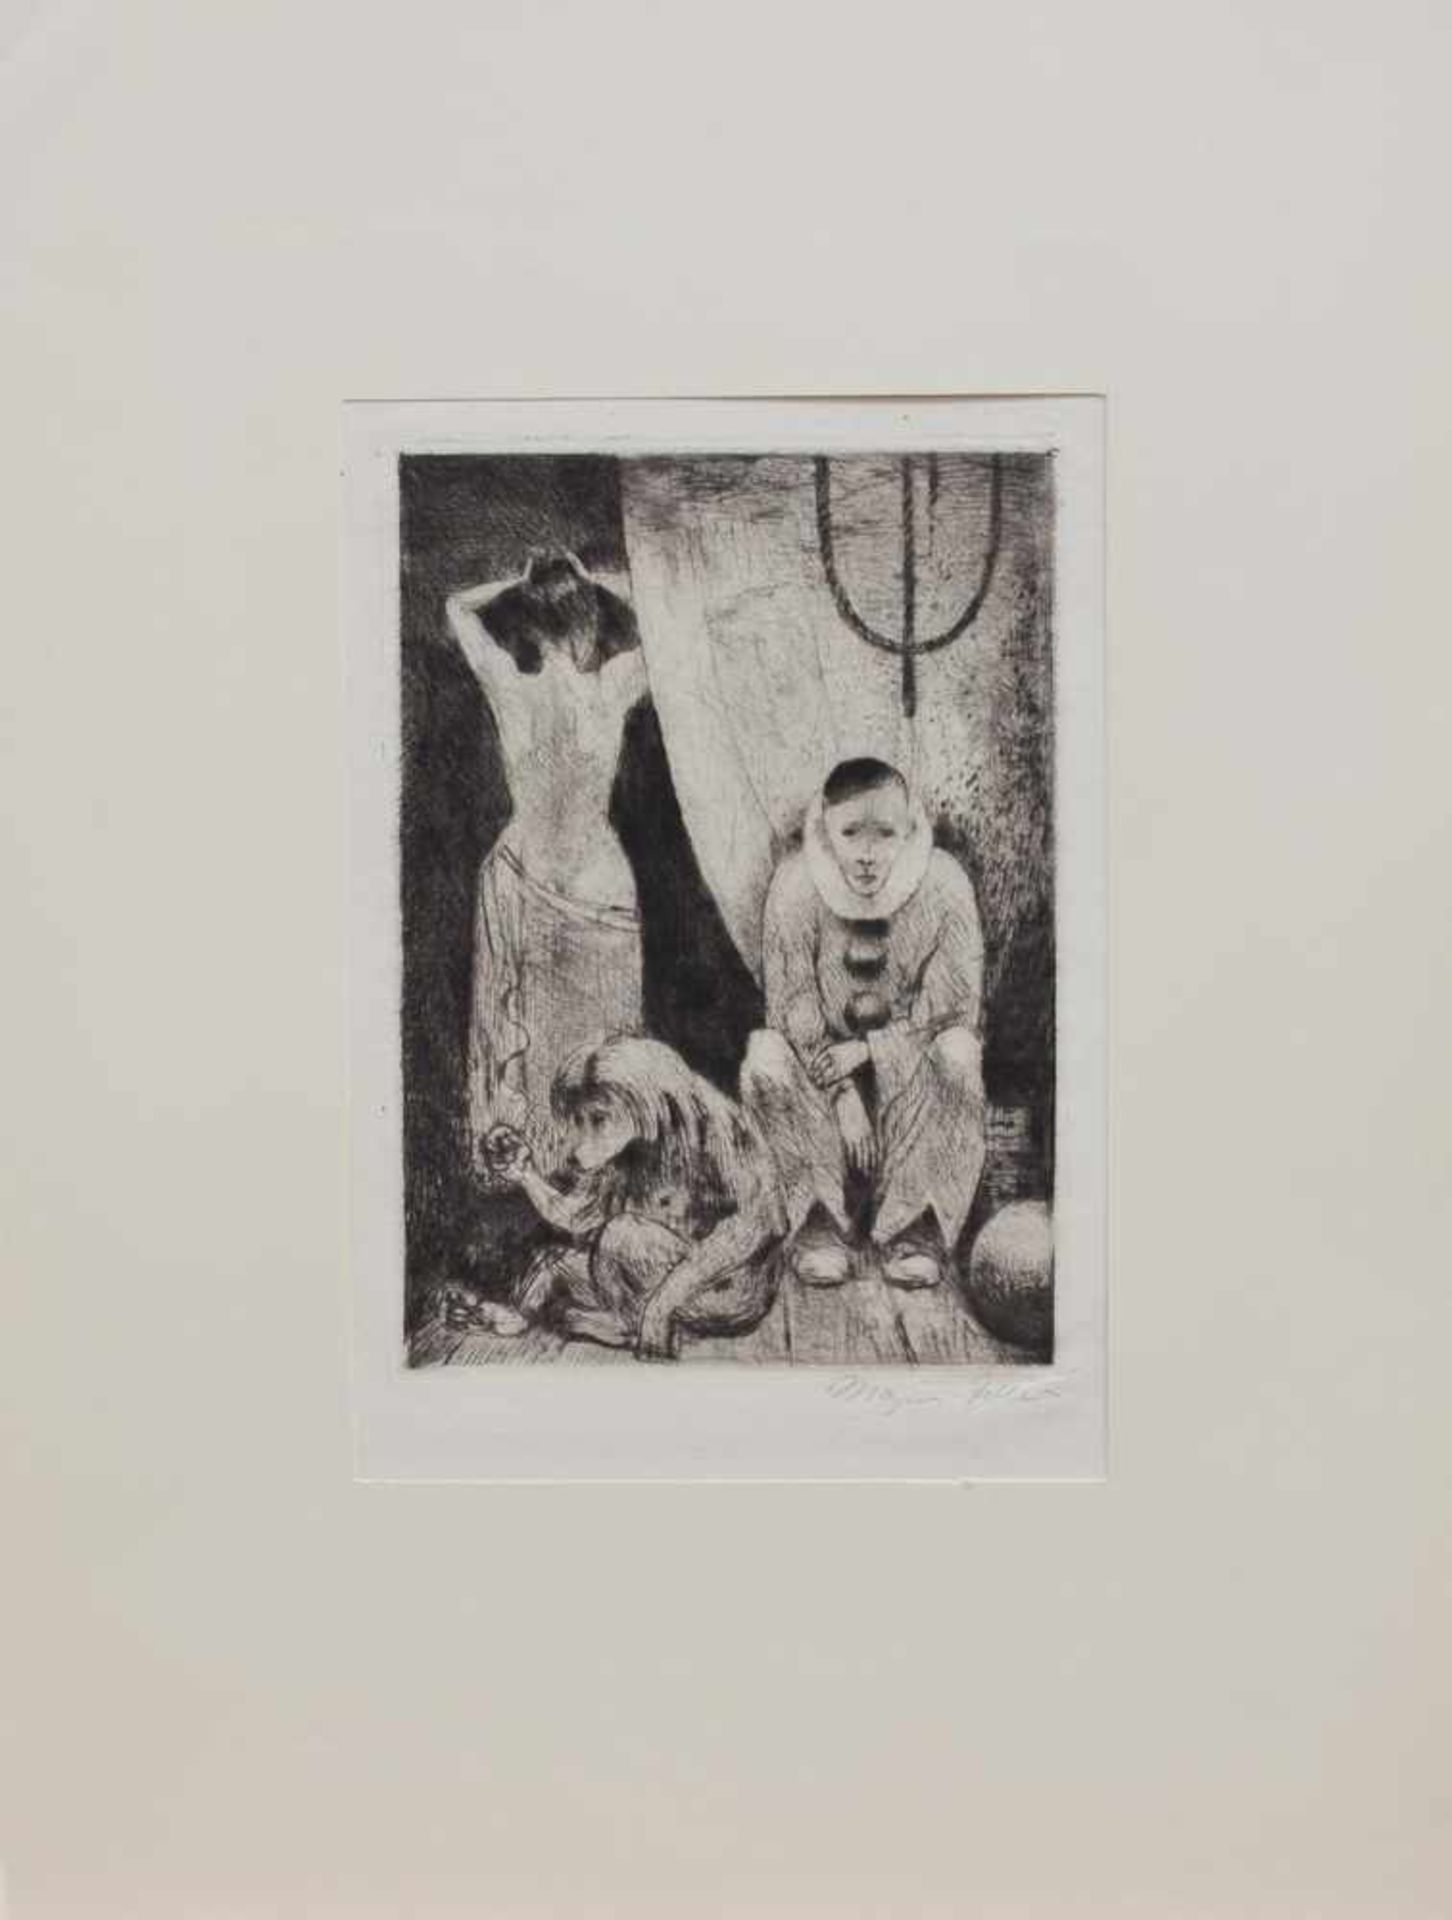 Los 57 - Magnus Zeller (Biesenrode 1888 - 1972 Berlin, deutscher Maler u. Grafiker, Std. d. Malerei u.